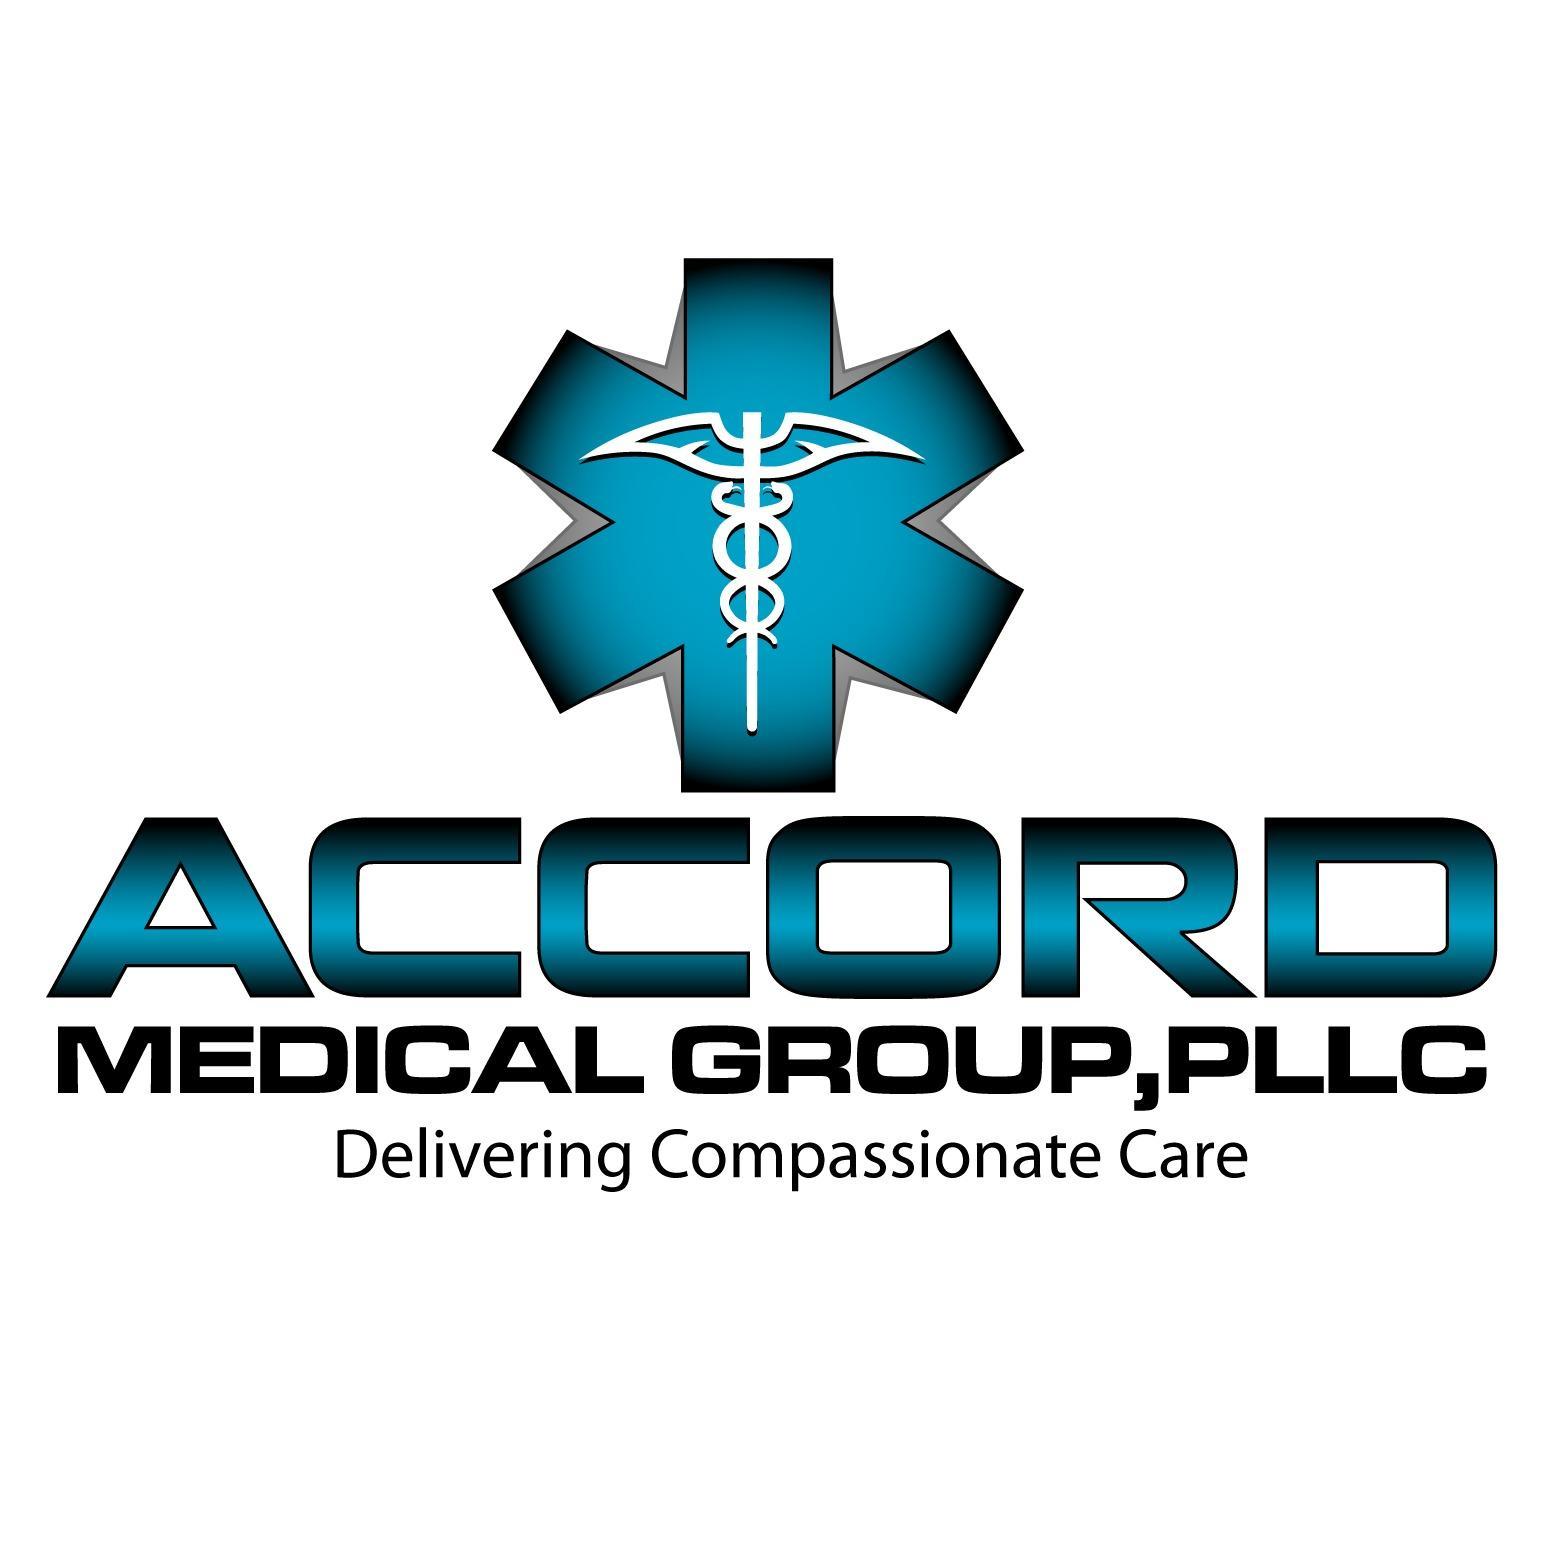 Accord Medical Group, PLLC